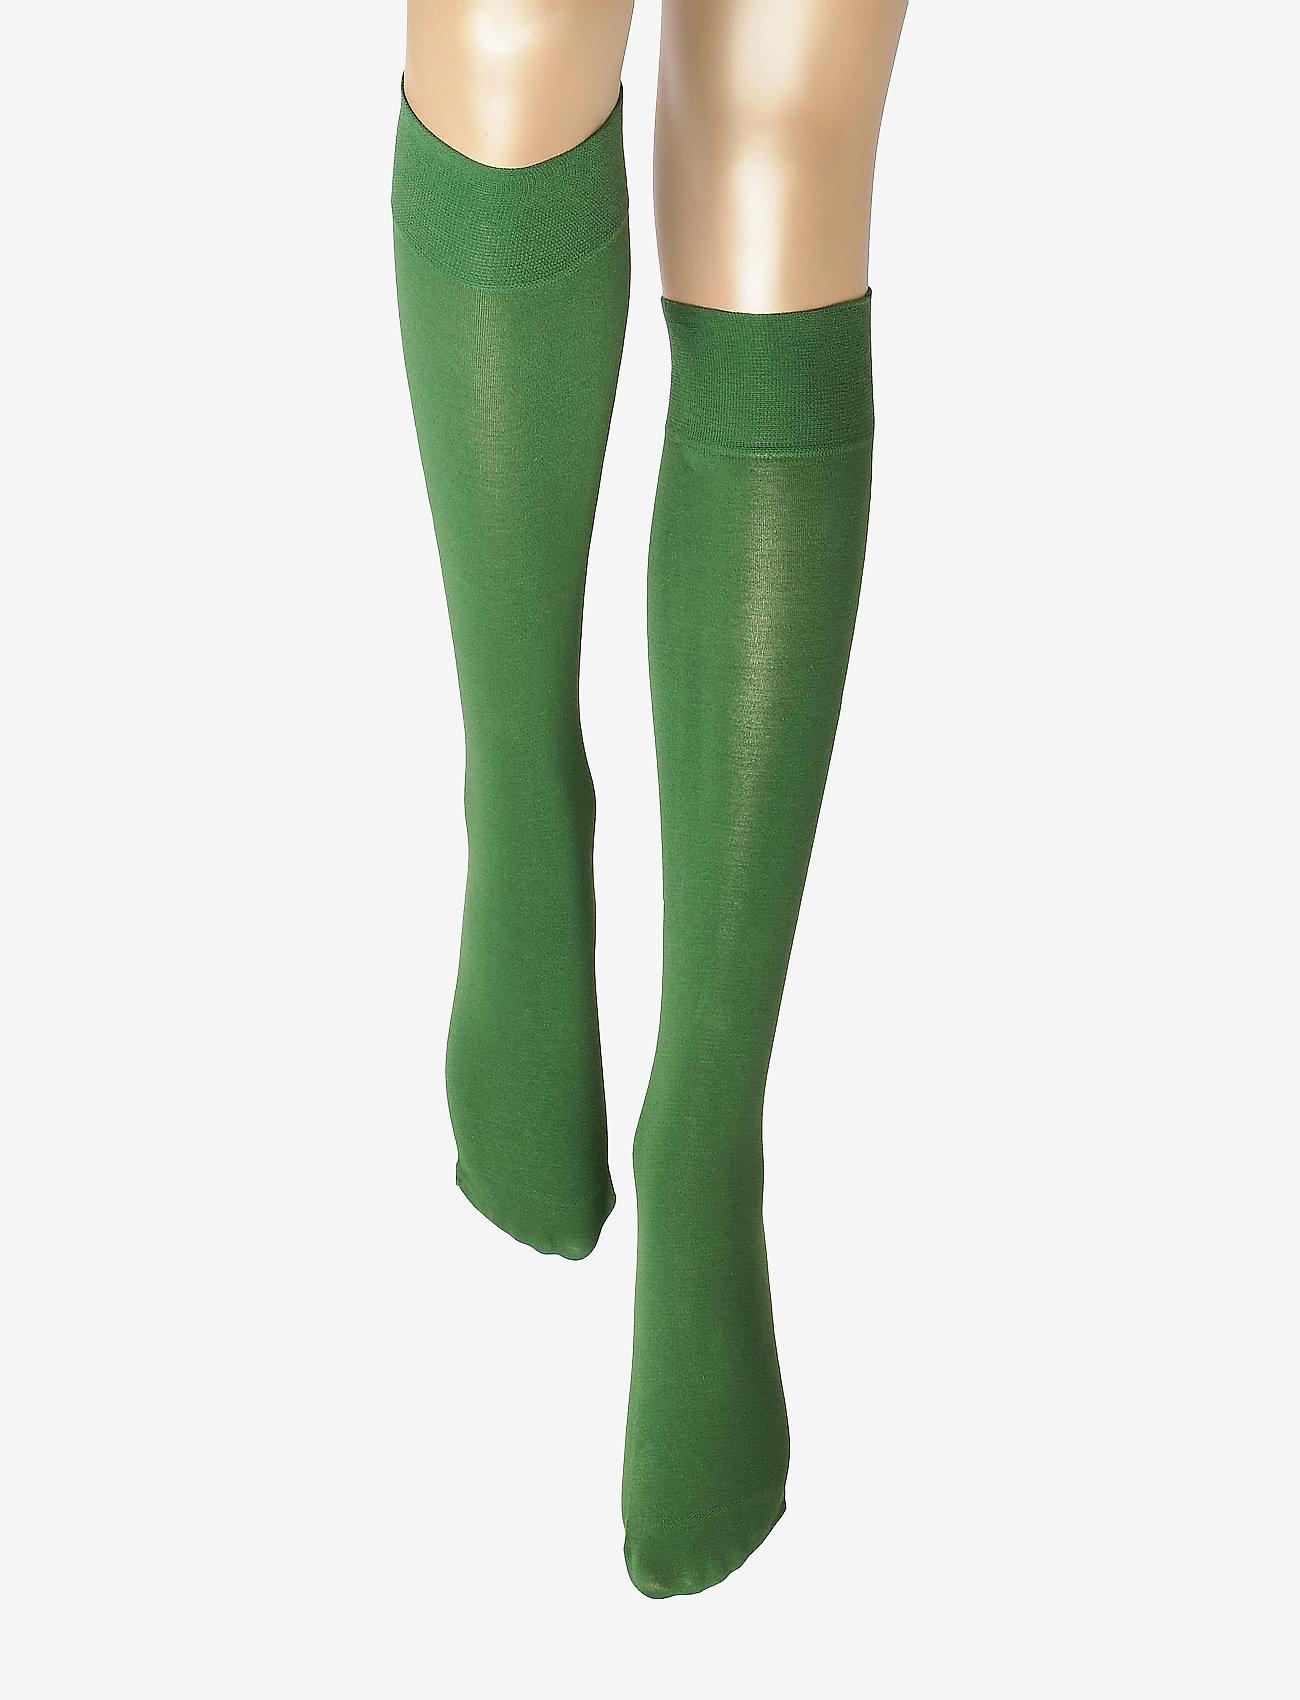 Vogue - Ladies knee high, Silky Cotton Knee - knee-highs - green - 1